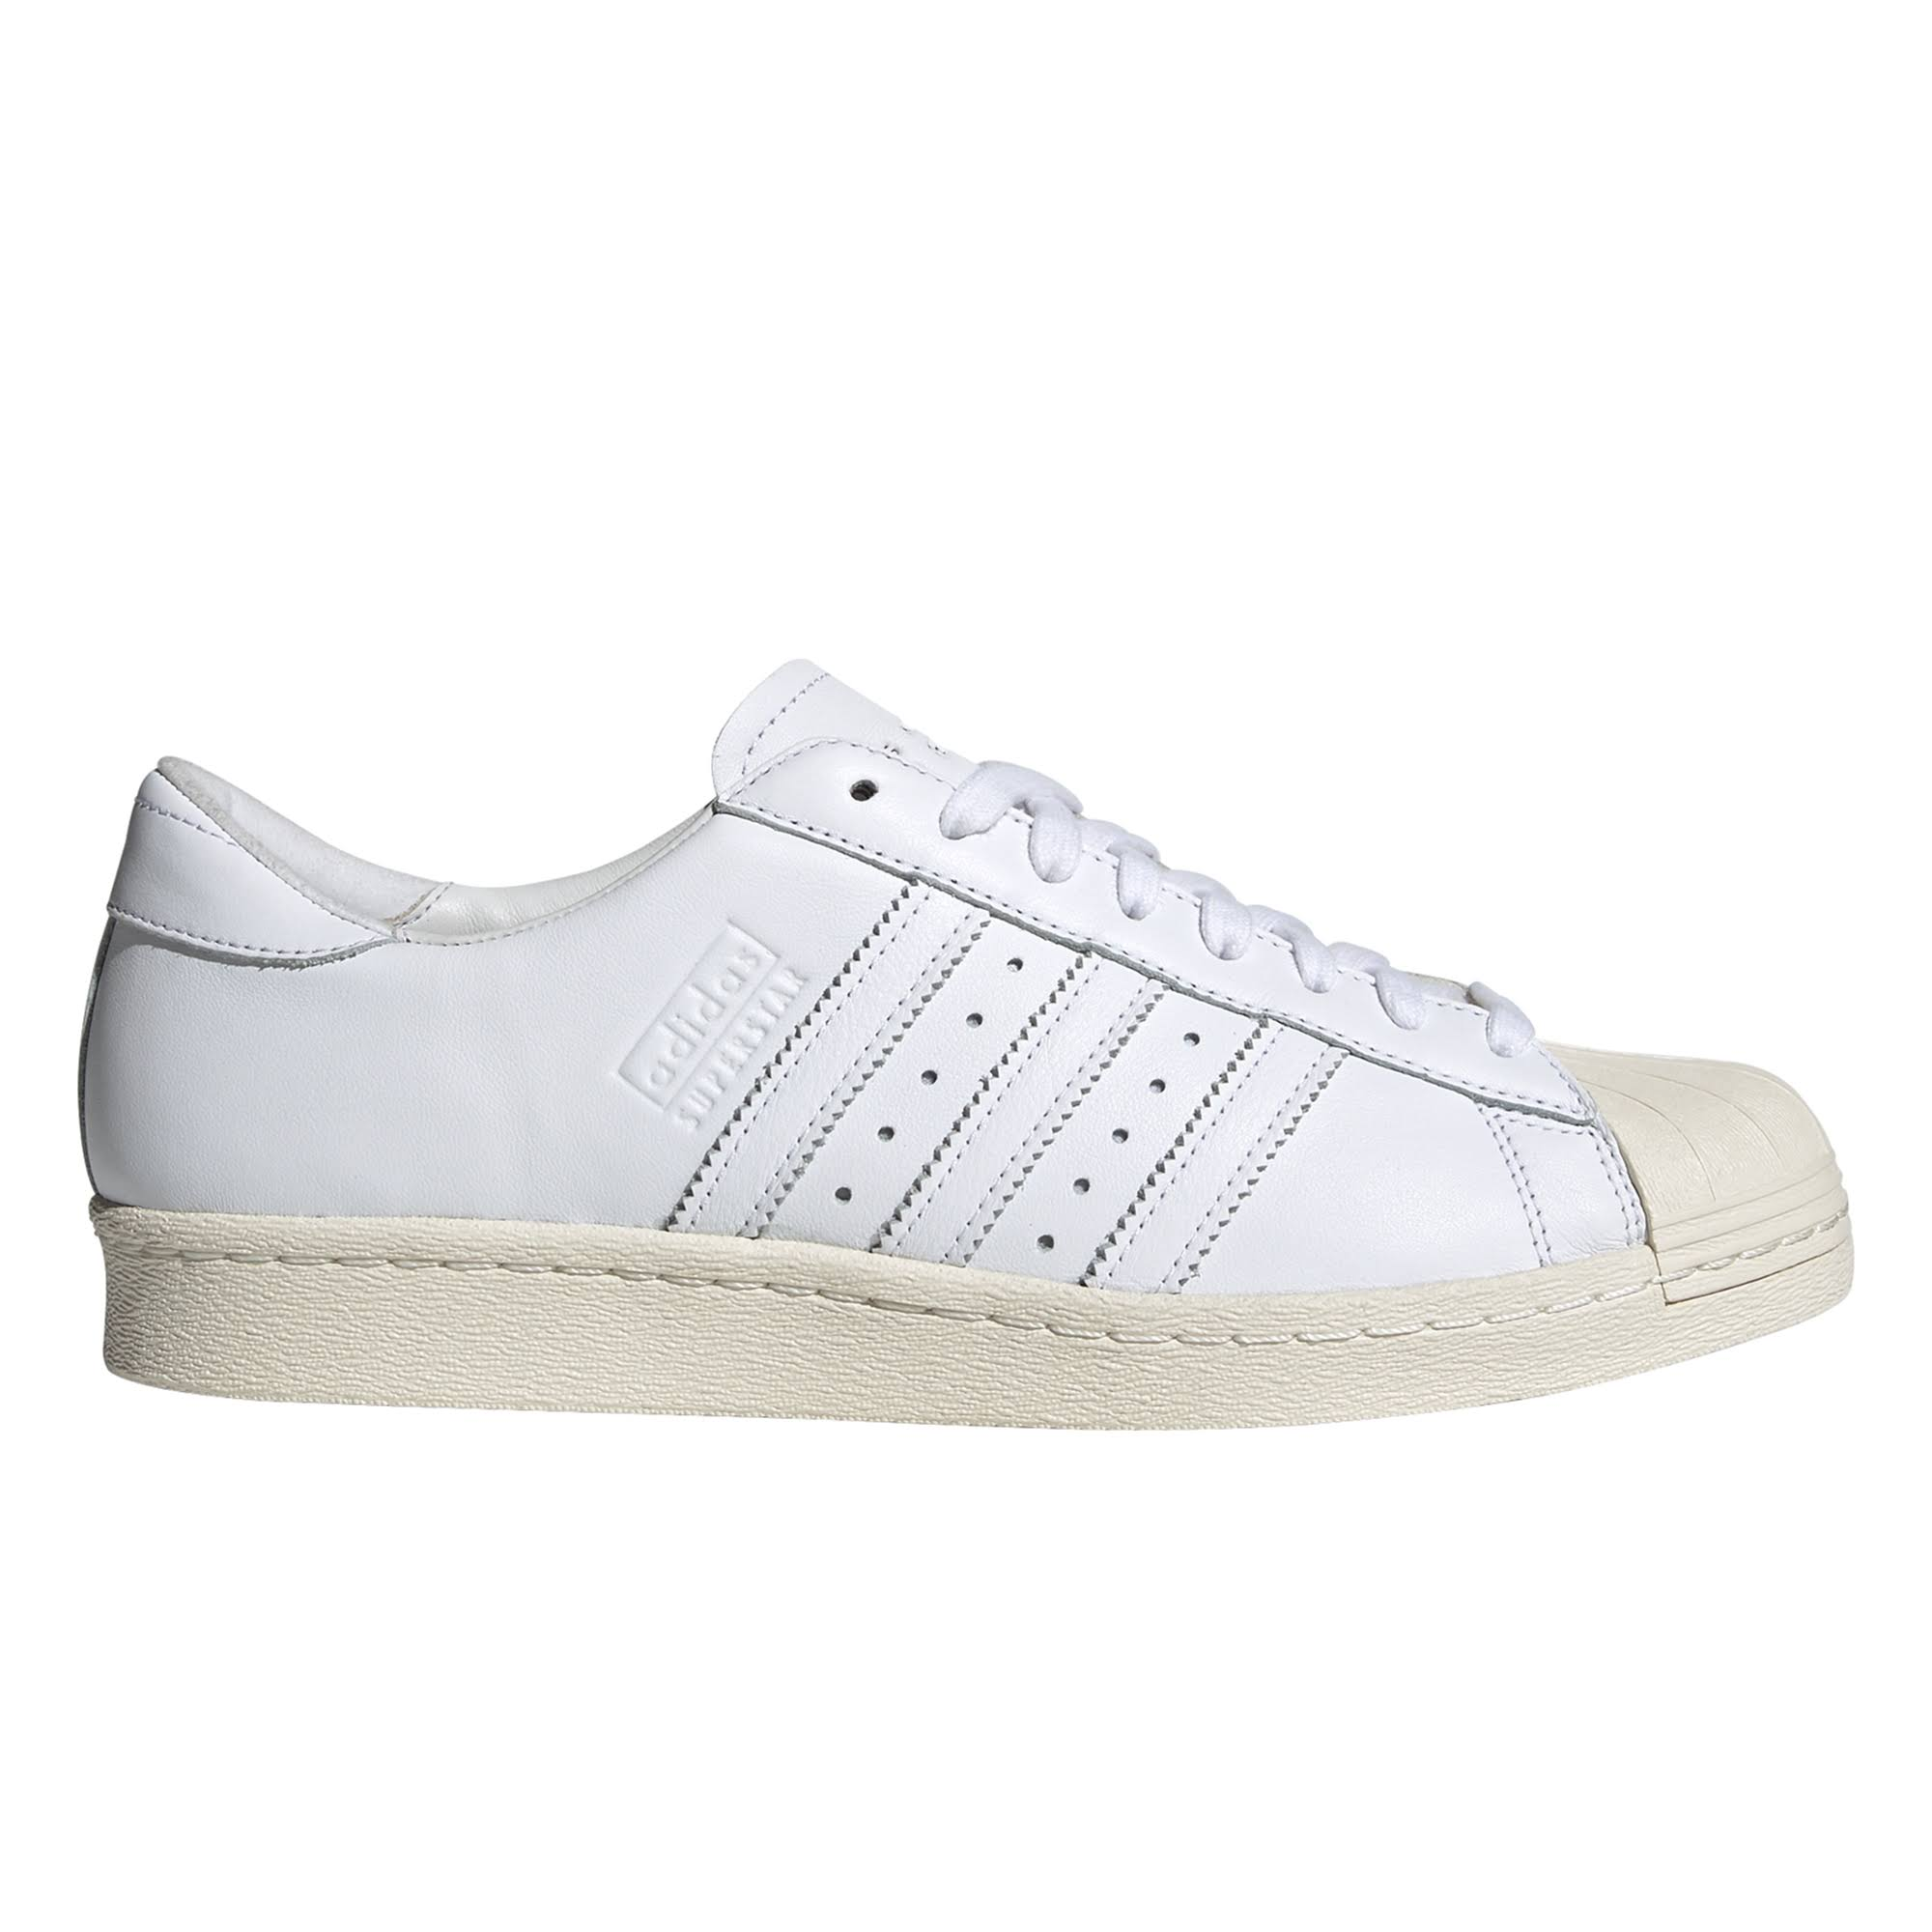 Adidas Superstar 80s Recon in White